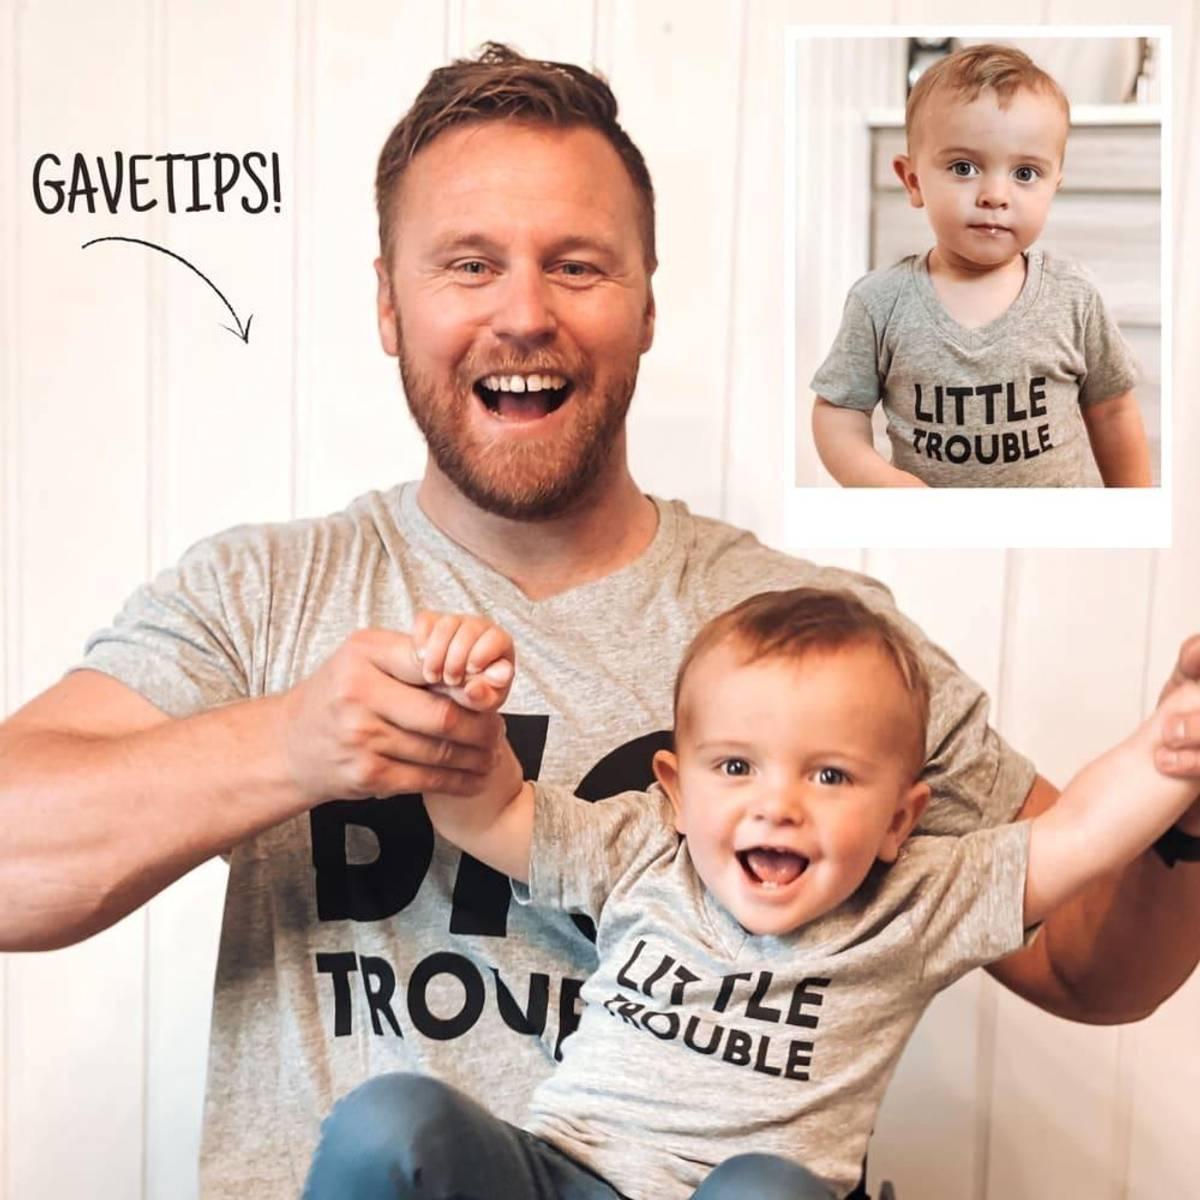 BIG TROUBLE & LITTLE TROUBLE: Matchende T-Skjorter